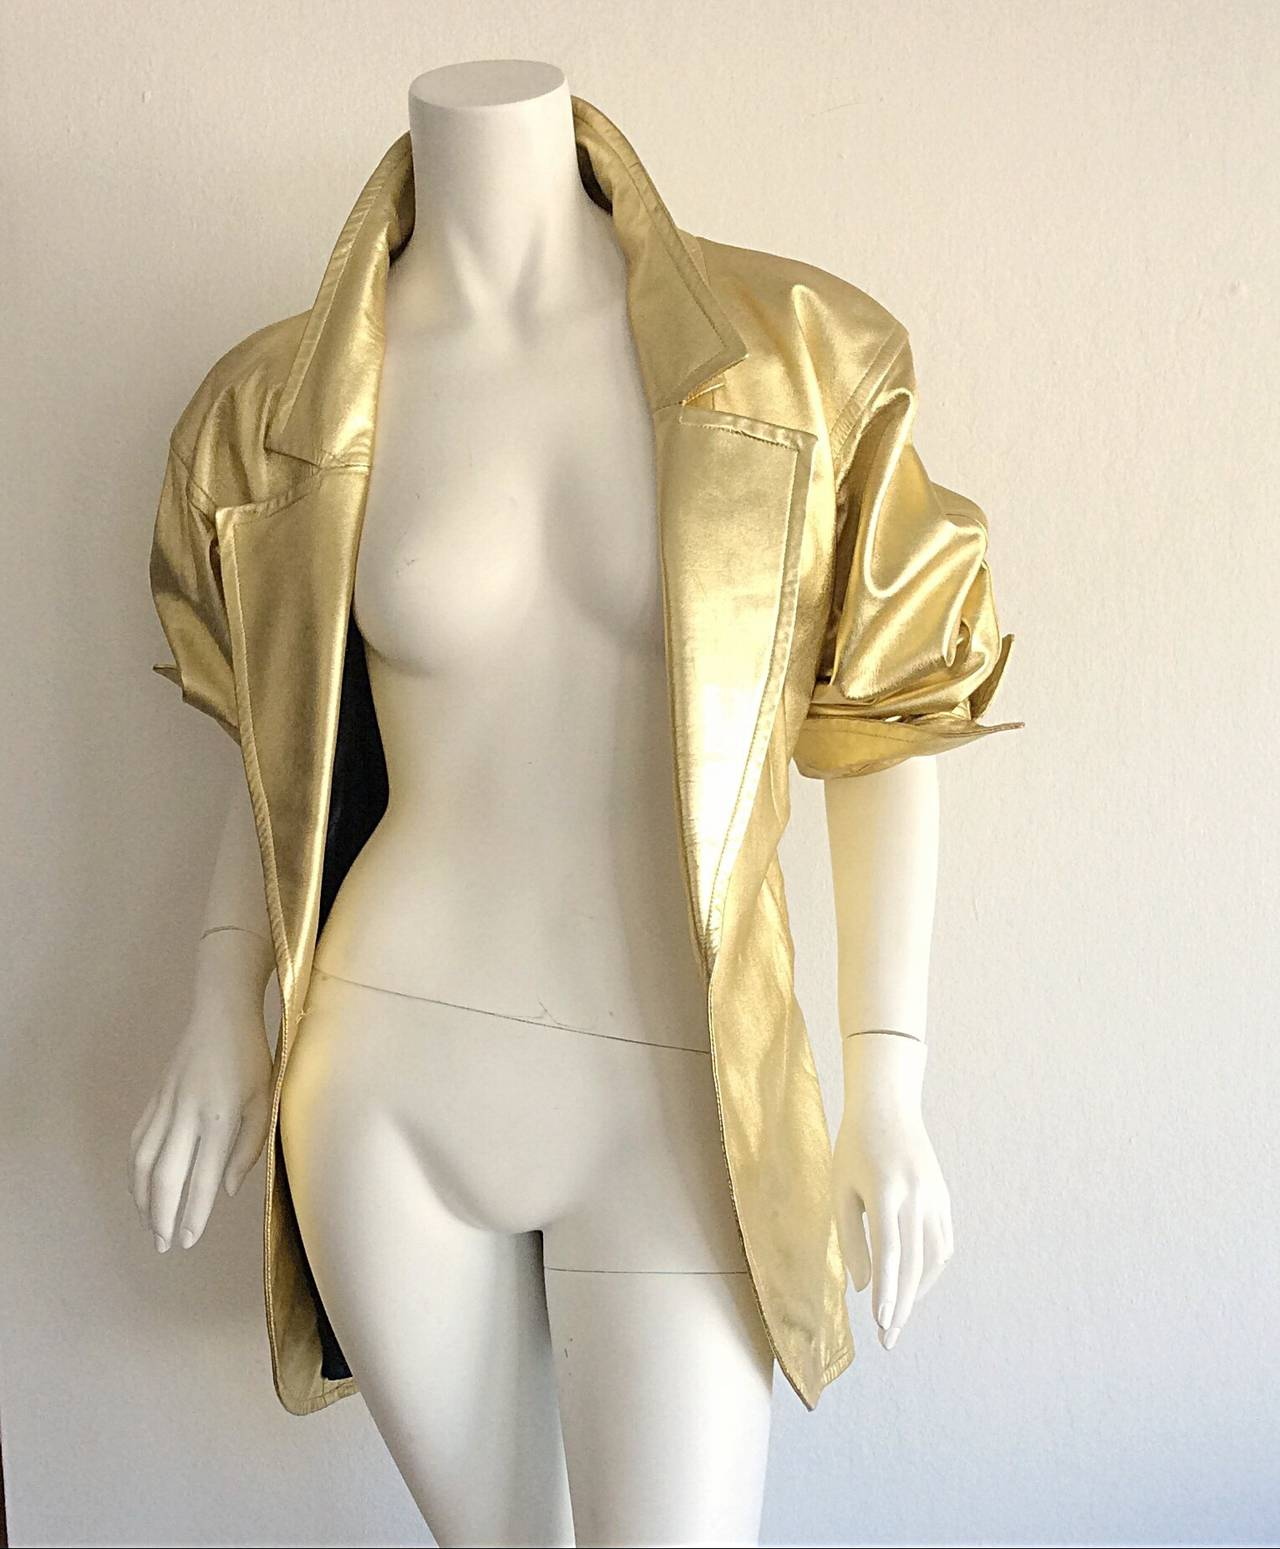 Vintage Yves Saint Laurent ' Rive Gauche ' Belted Gold Leather Jacket 6